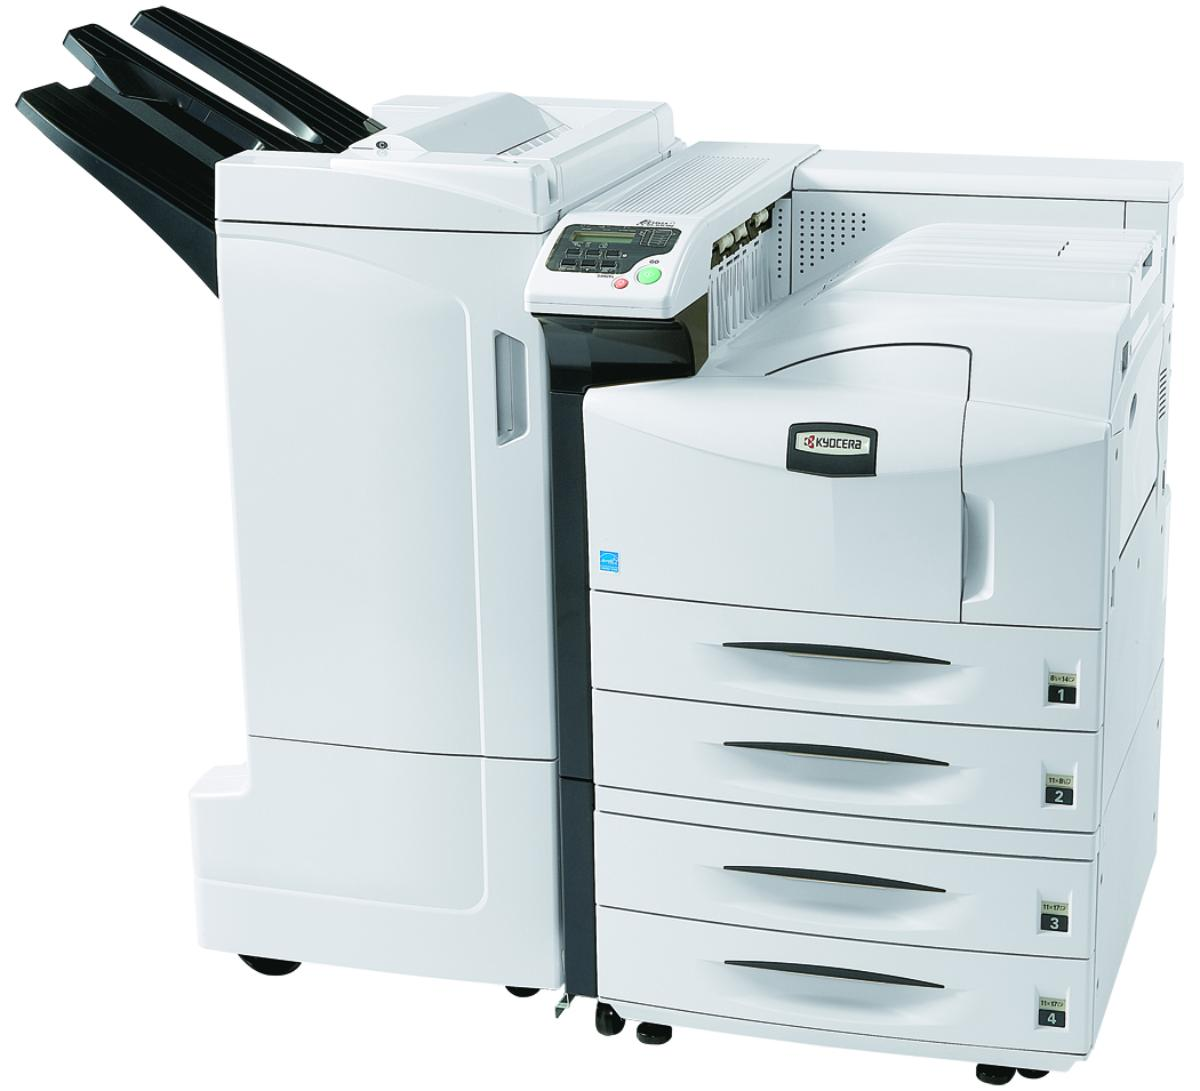 ECOSYS FS-9130dn / FS-9530dn kopimaskin og printer